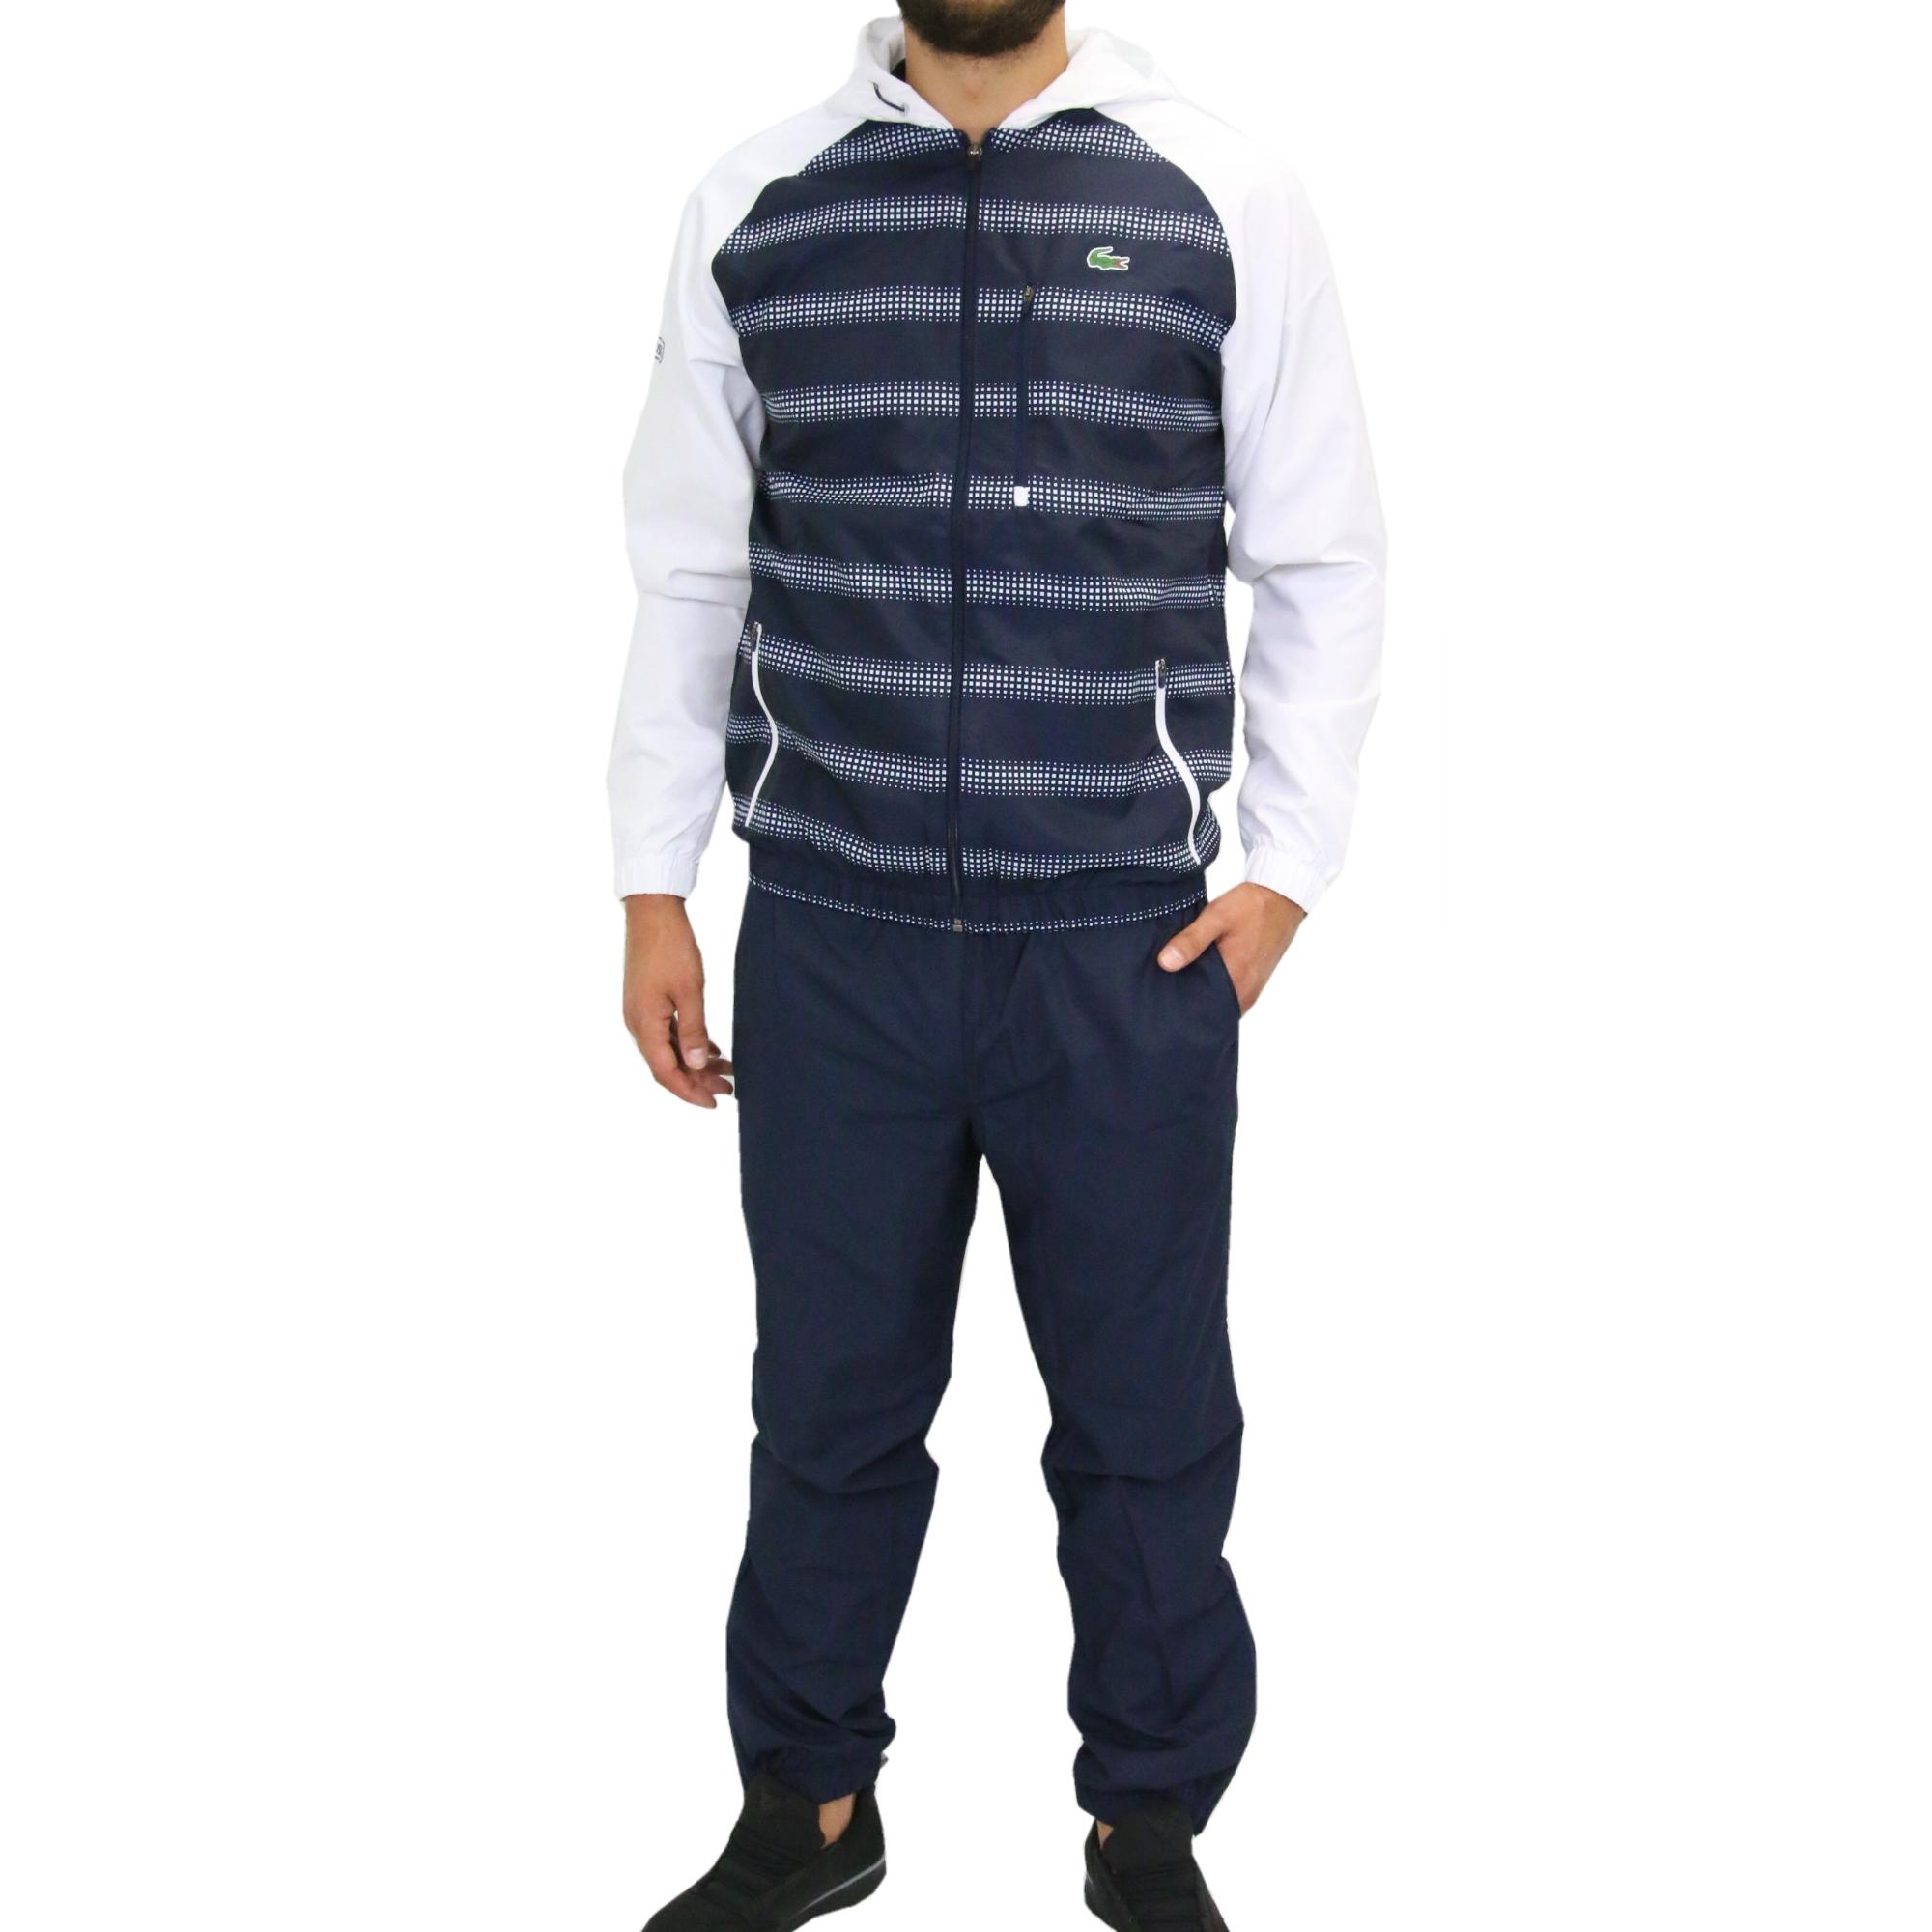 lacoste sport trainingsanzug sportanzug jogginganzug herren blau wh5525 r20 ebay. Black Bedroom Furniture Sets. Home Design Ideas